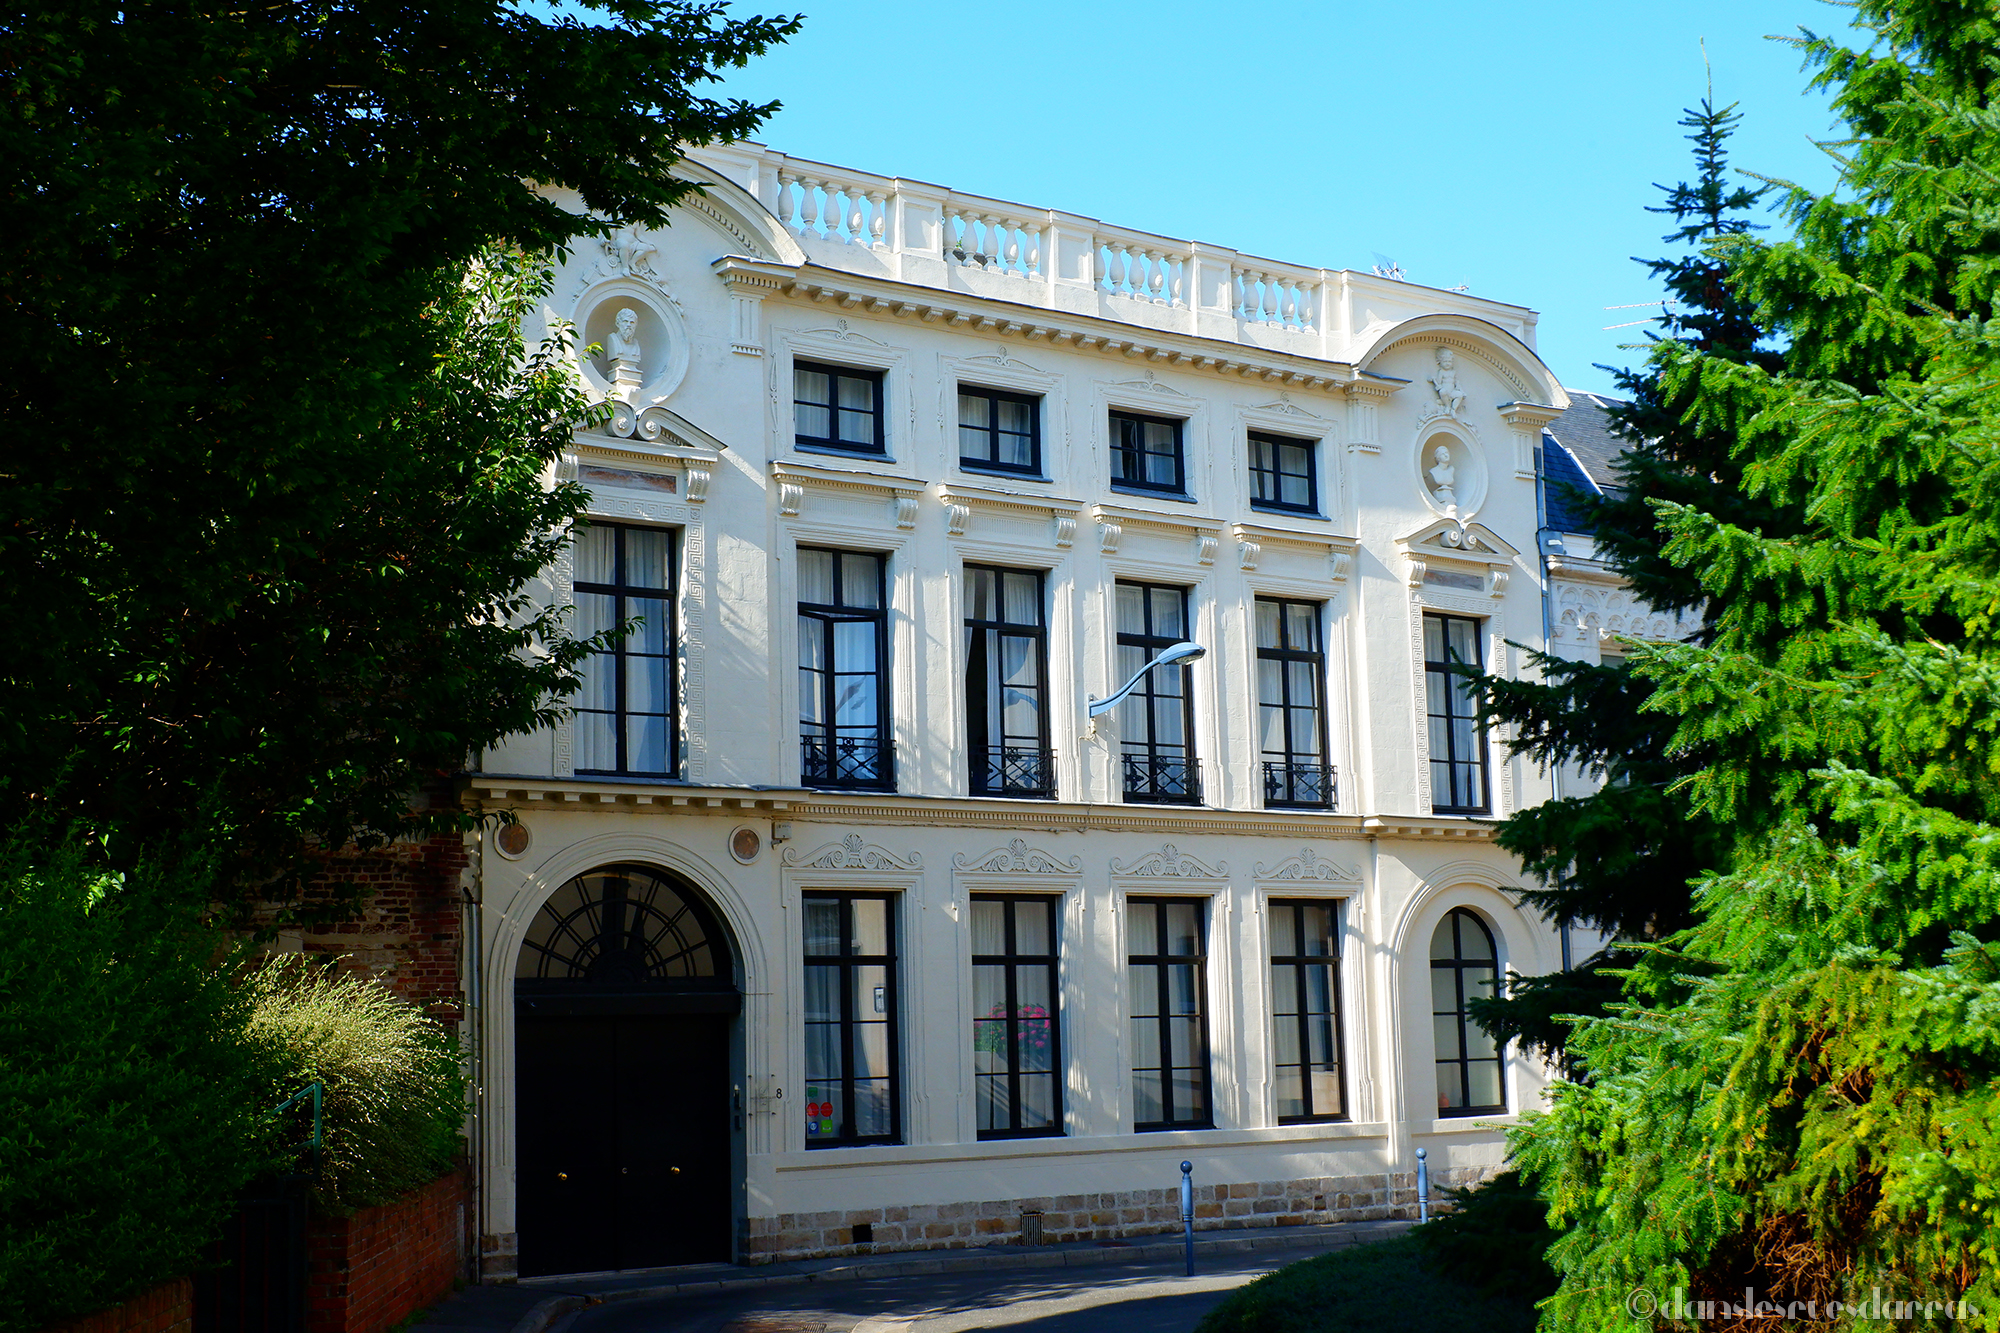 Hôtel Brunet - 8 rue du Péage - Arras (©MD - danslesruesdarras)